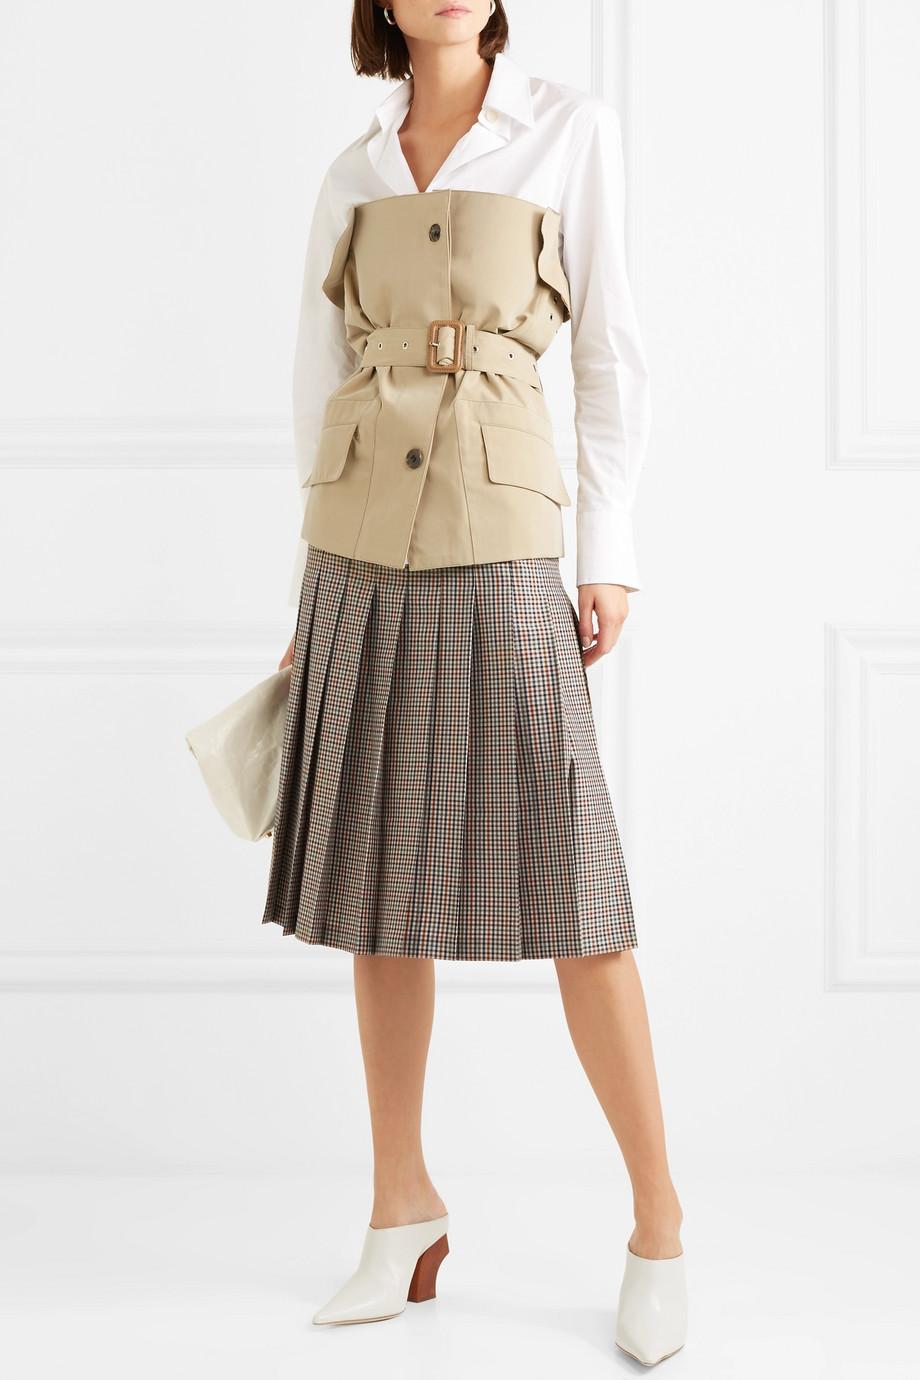 Maison Margiela Checked pleated wool, mohair and silk-blend midi skirt $476